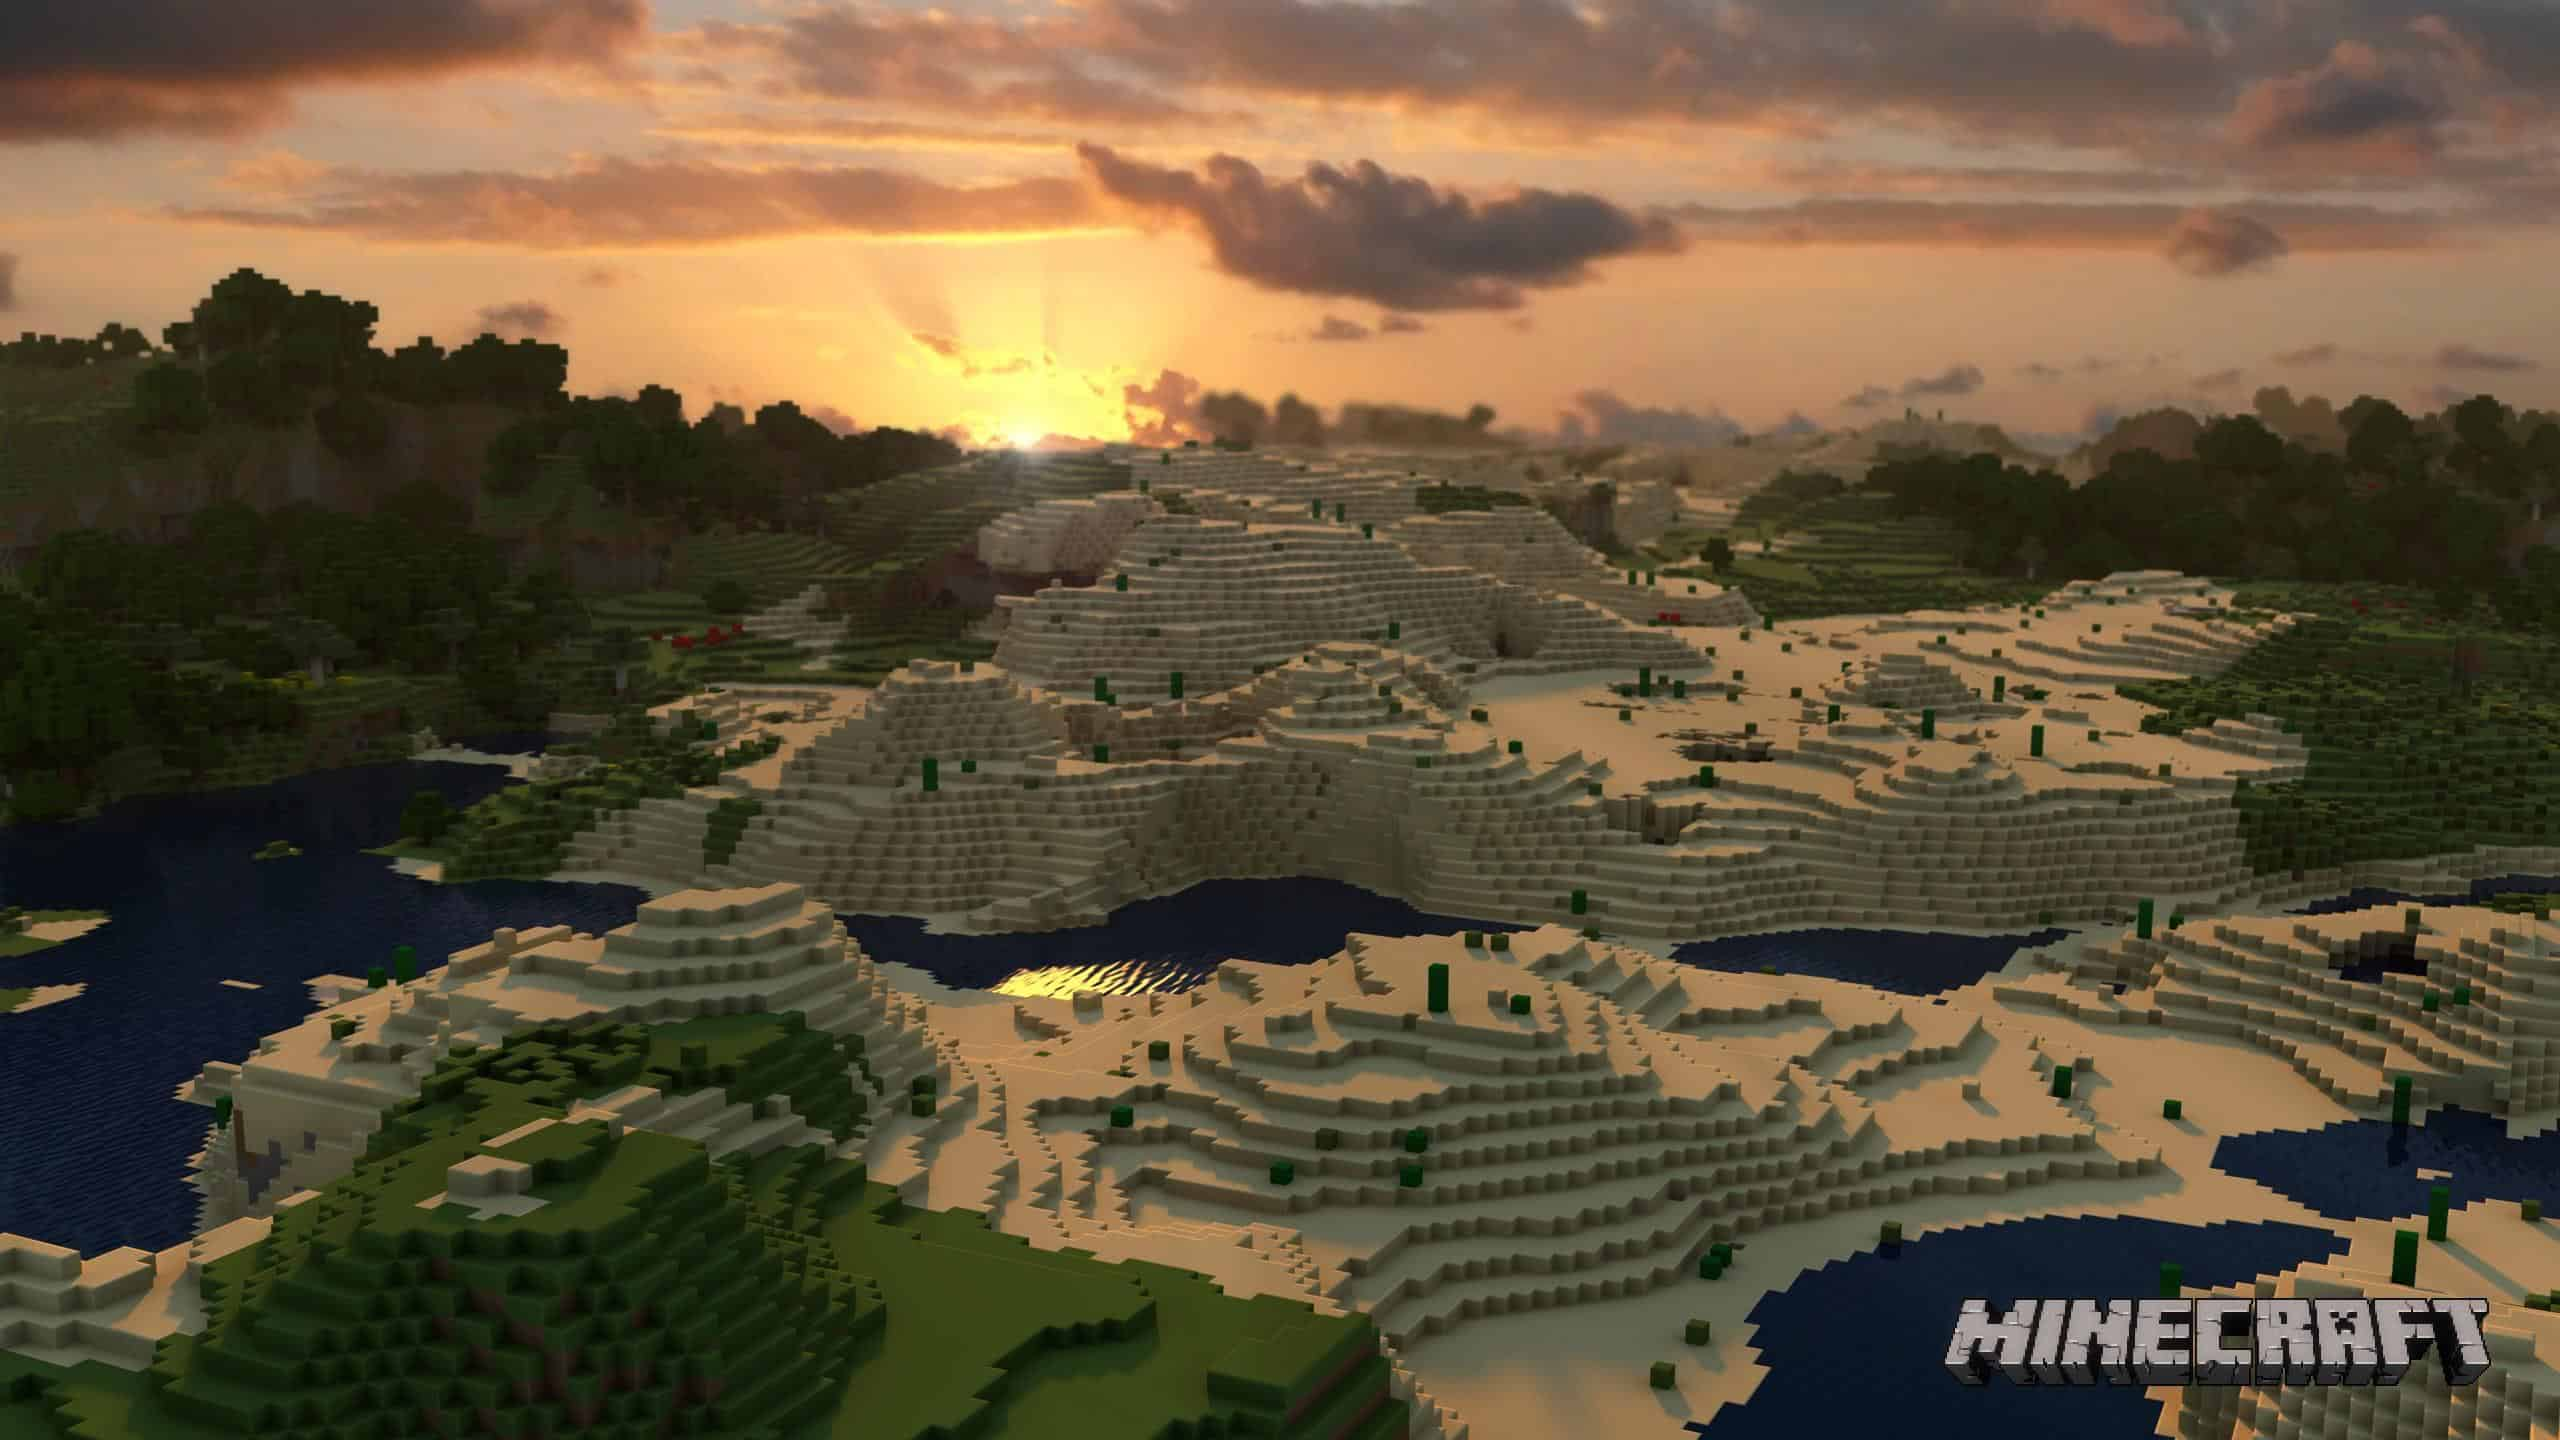 Minecraft Landscape Wqhd 1440p Wallpaper Pixelz